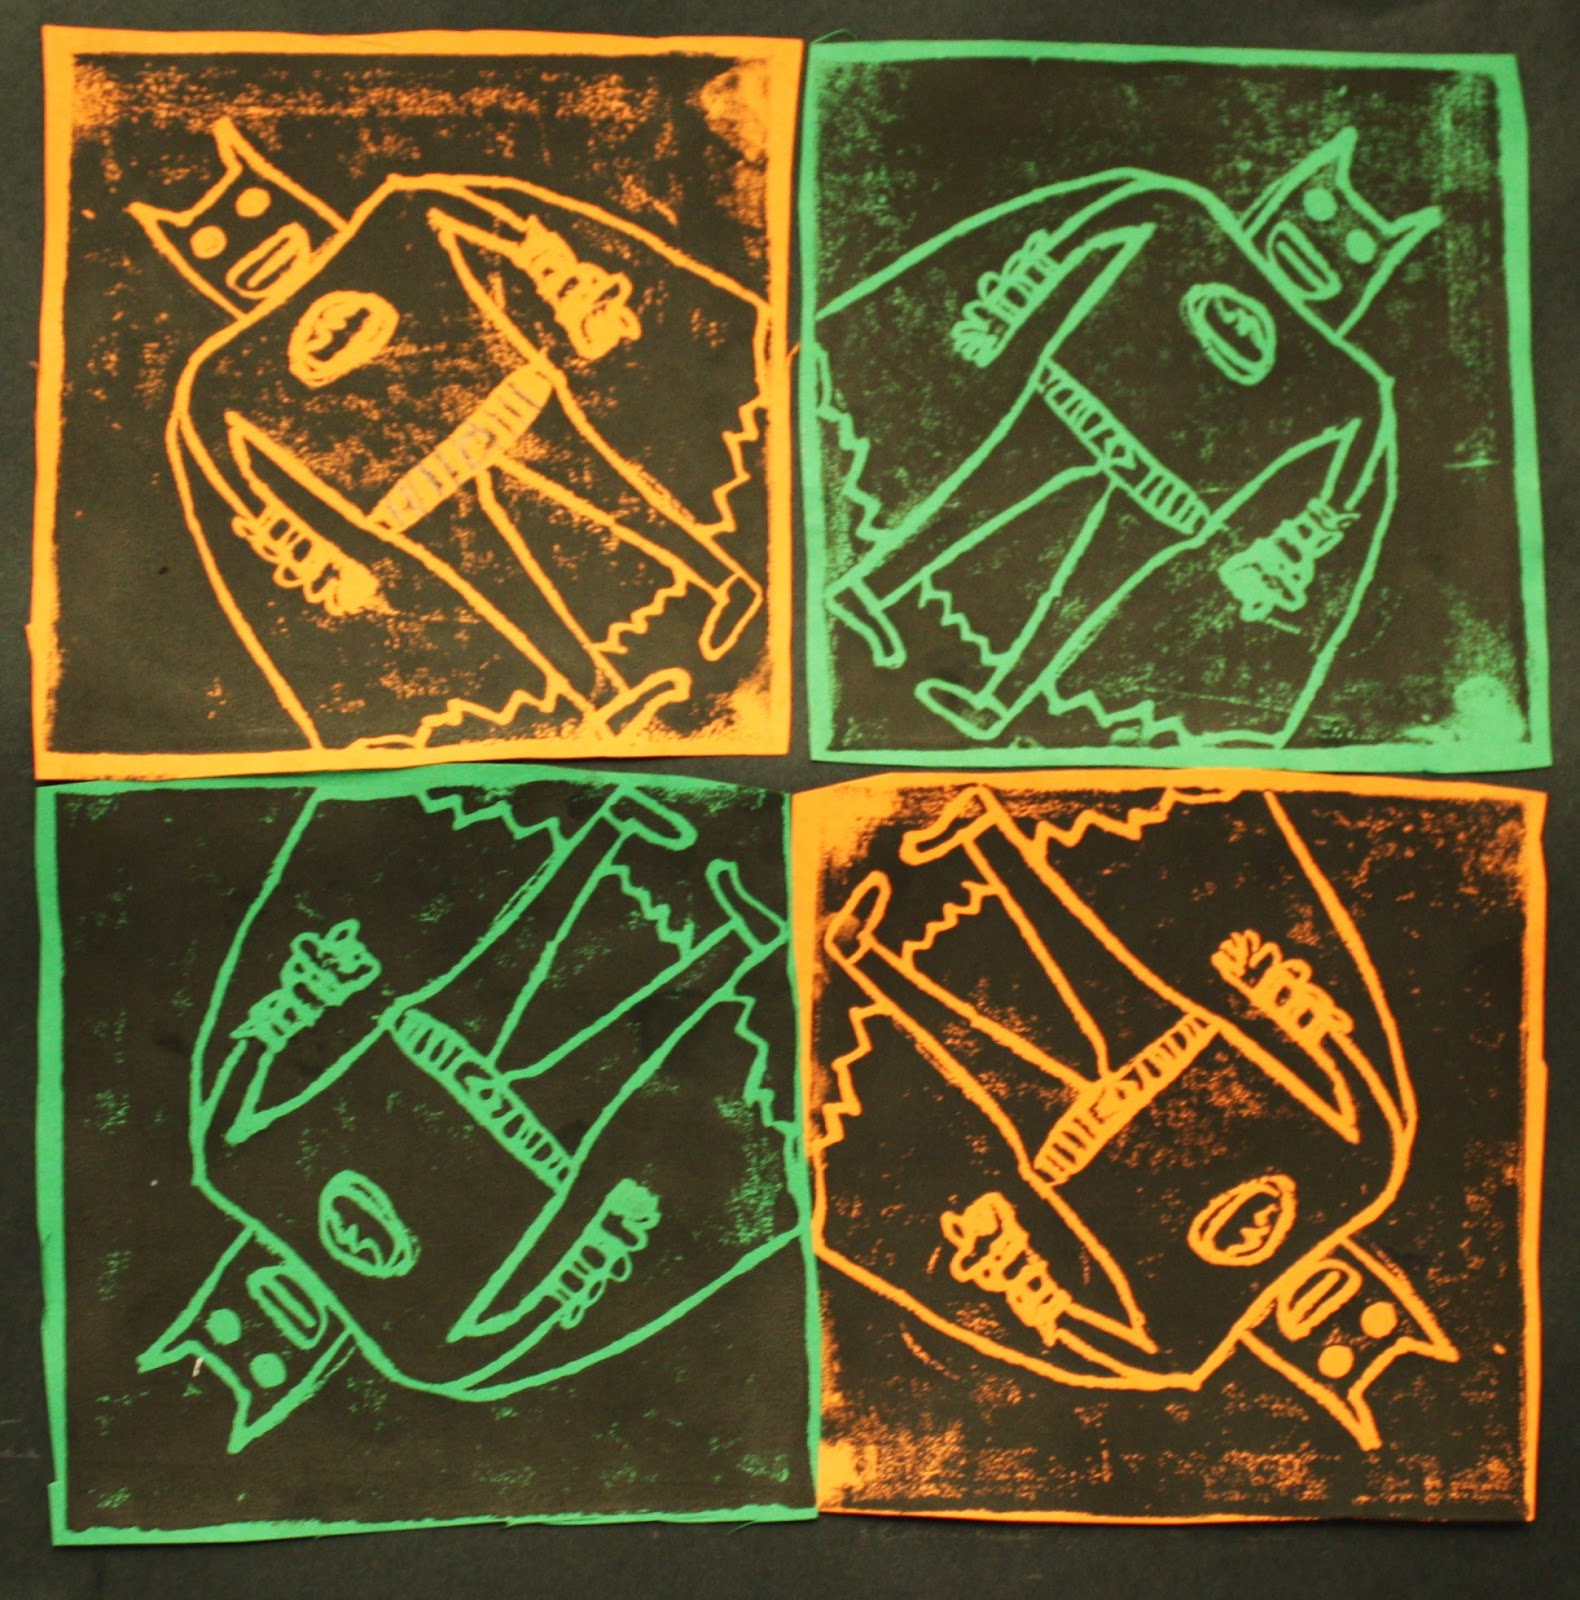 super best friends art, american folk art, grade 8 art, eighth grade art, seventh grade art, kindergarten art, third grade clip art, van gogh art, professor chaos art, paper quilling art, toilet paper art, grade 4 clip art, middle school art, pencil crayon art, grade 7 art, tenth grade clip art, grade 1 clip art, 4th of july art, australian art, on 4th grade november art